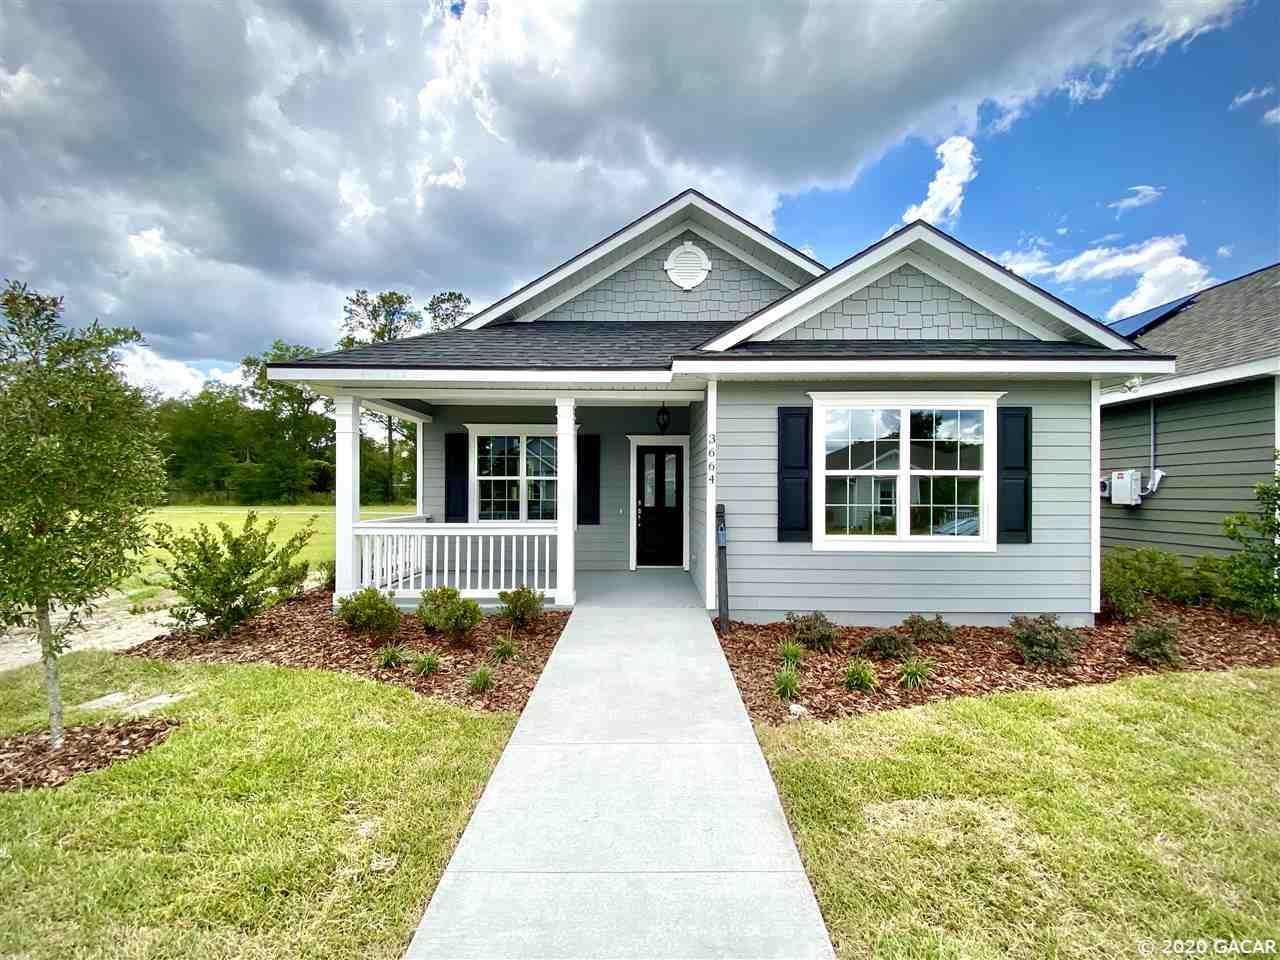 3664 NW 26 th Street, Gainesville, FL 32605 - #: 432580